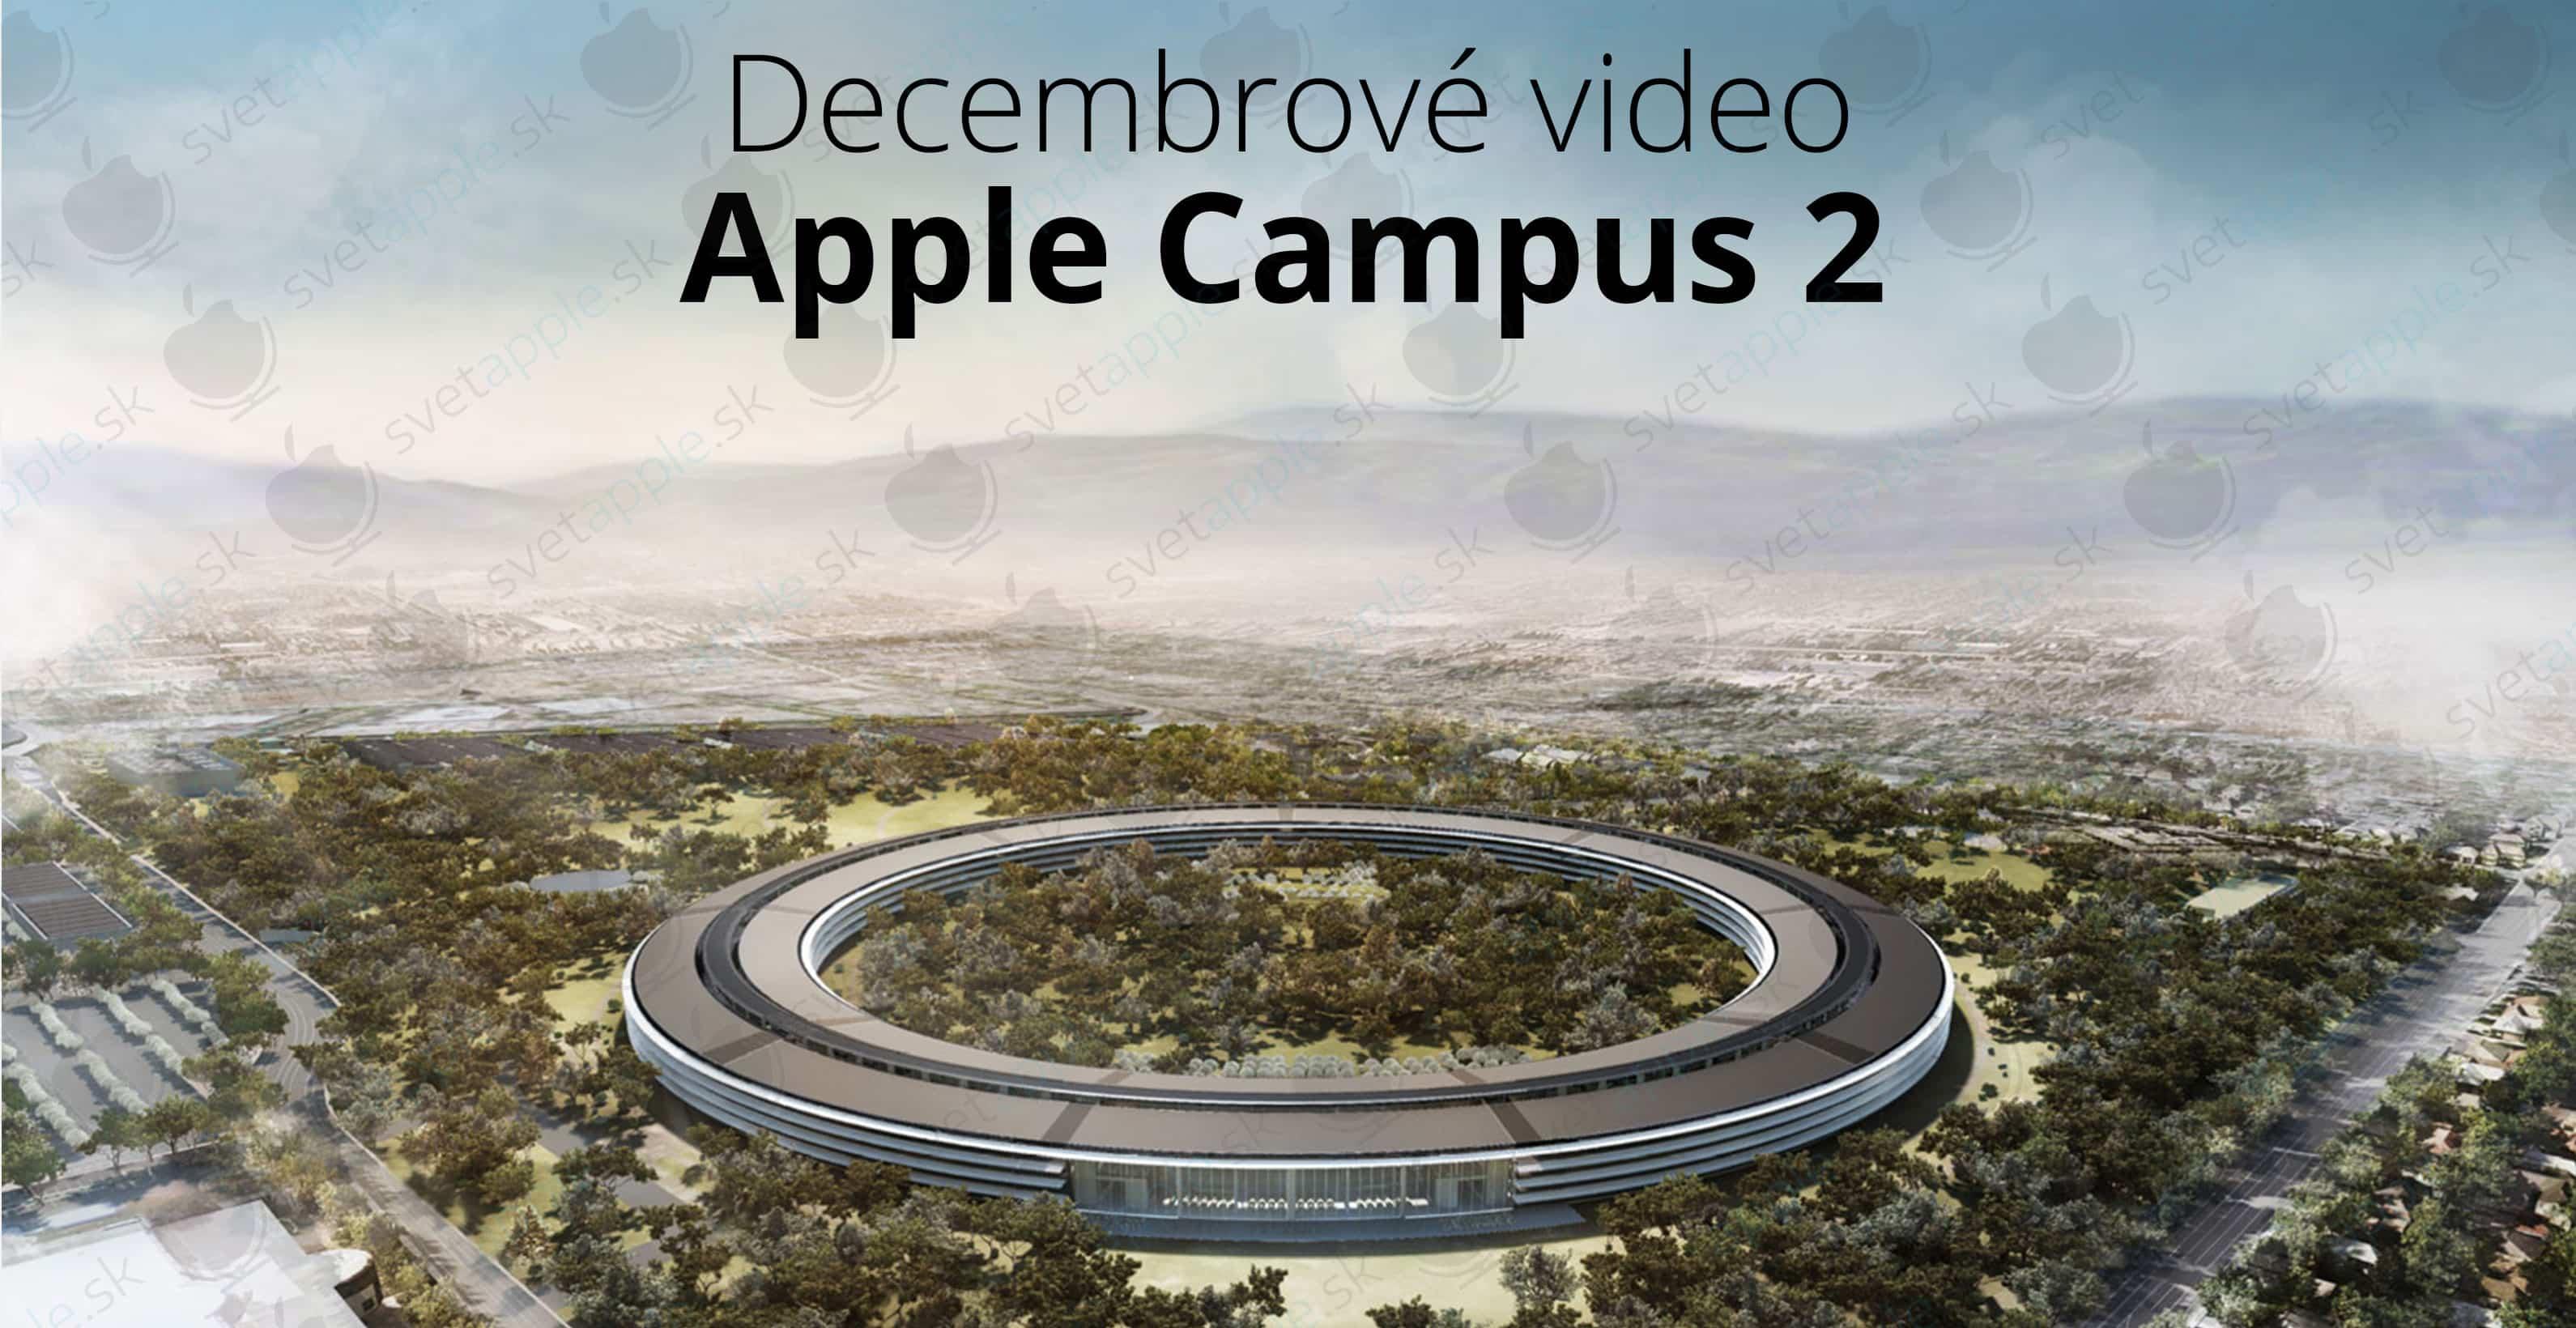 apple-campus-2-december---titulná-fotografia---SvetApple